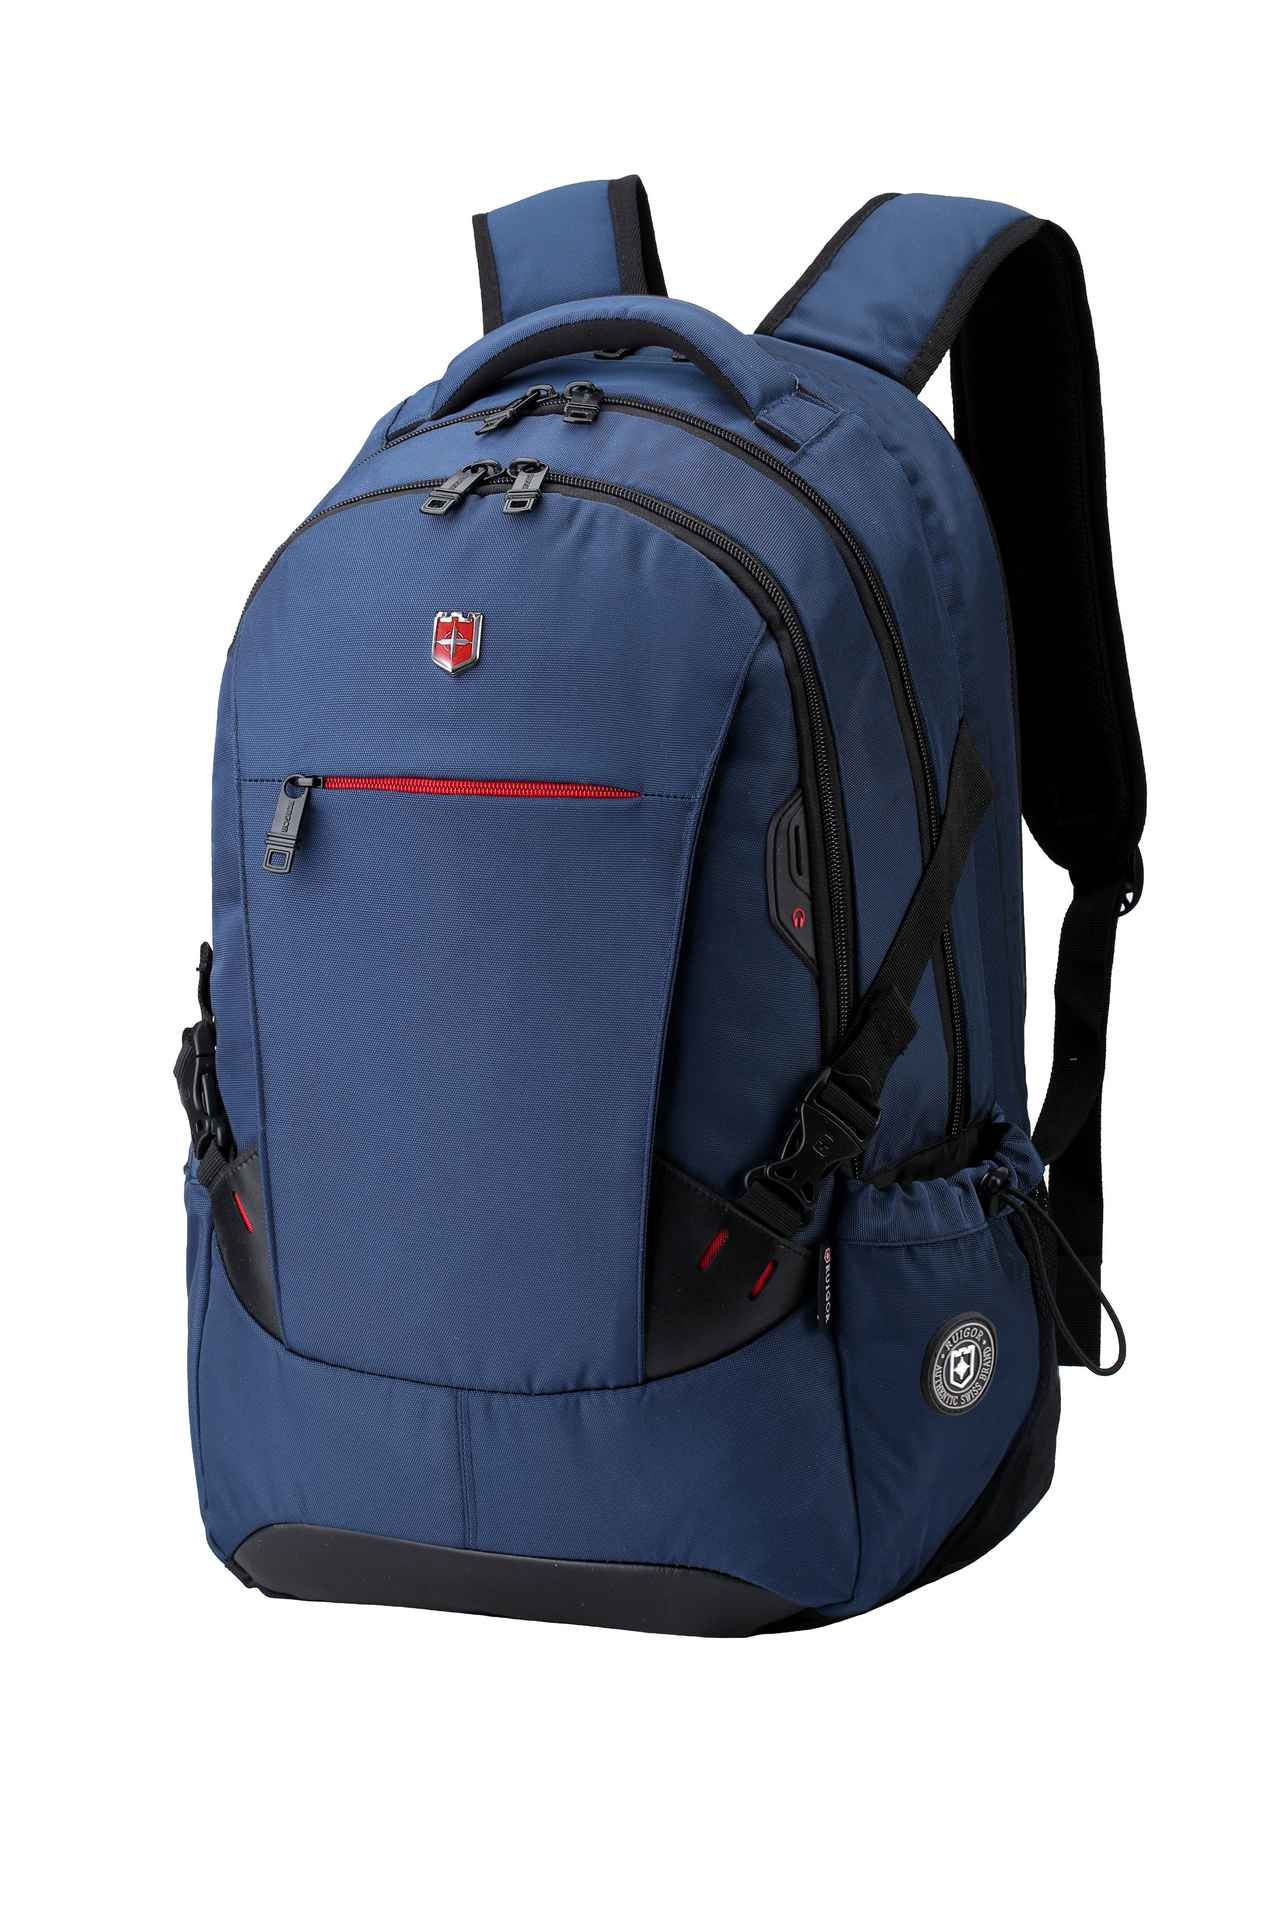 RUIGOR ICON 81 Laptop Backpack Blue